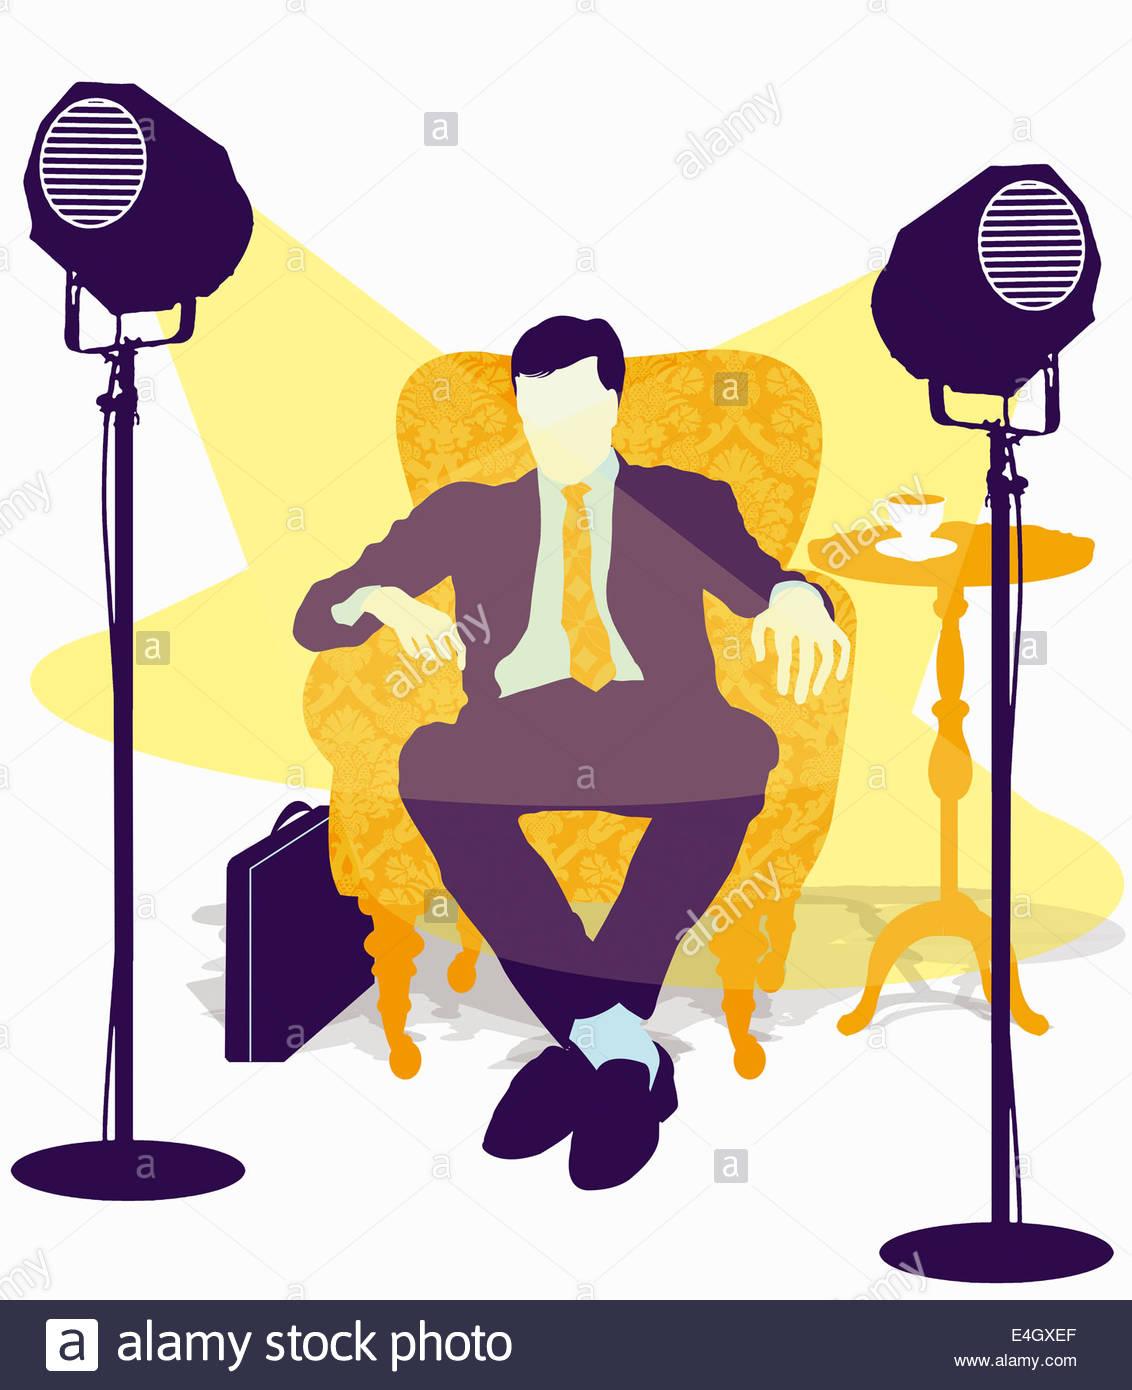 Spotlights on businessman sitting in armchair - Stock Image